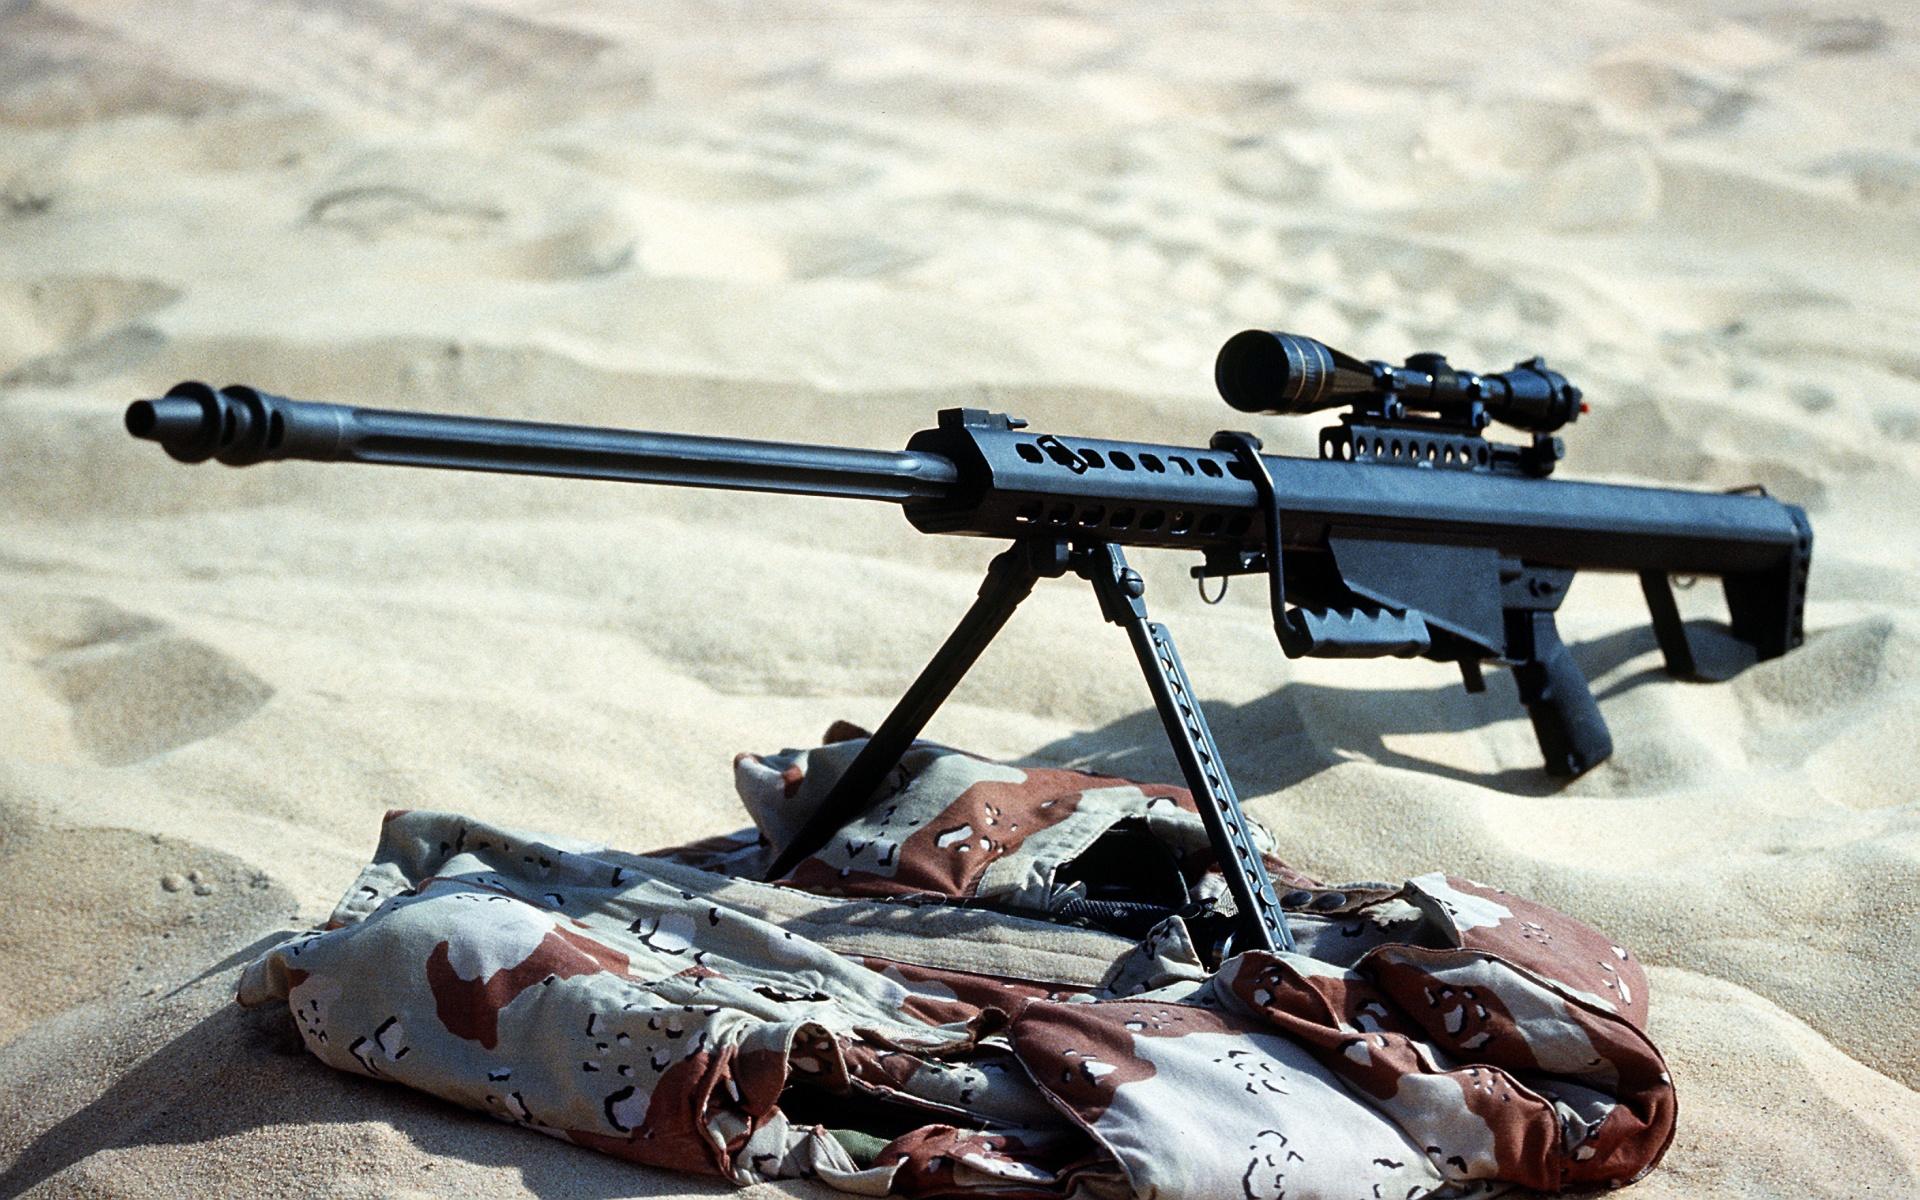 50 Caliber Sniper Wallpapers - 1920x1200 - 991186